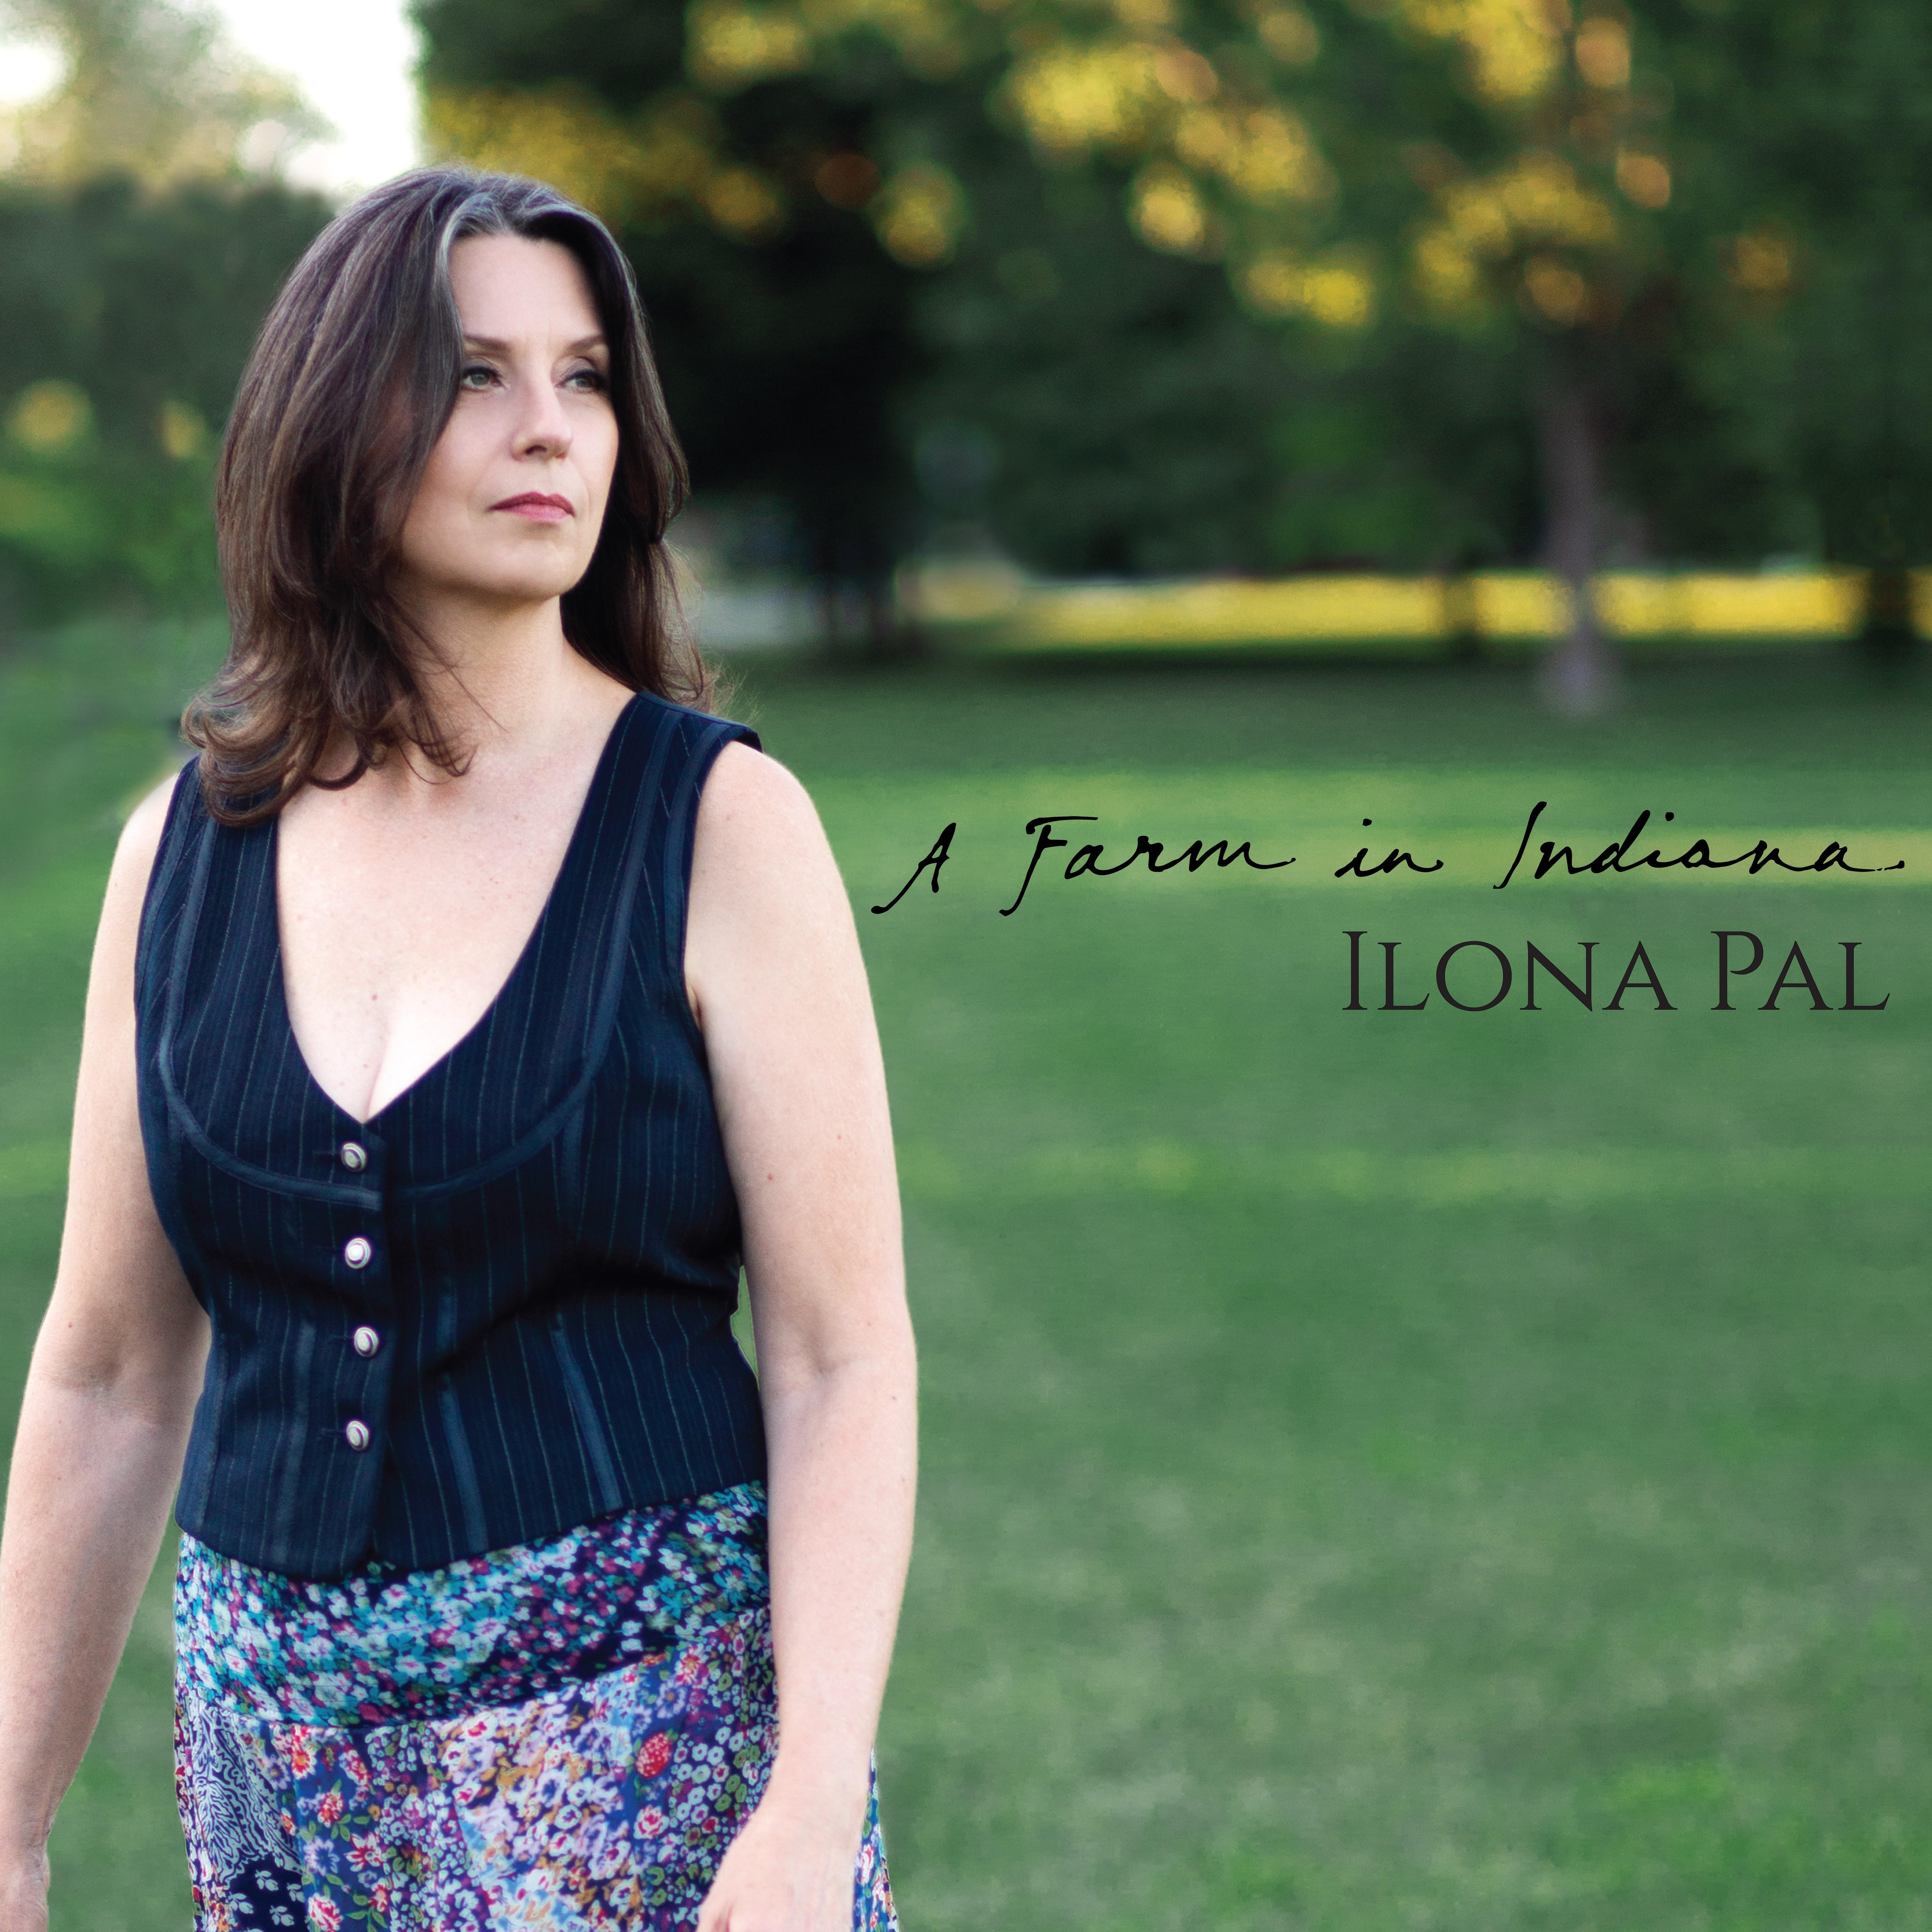 Ilona Pal cd single cover artwork